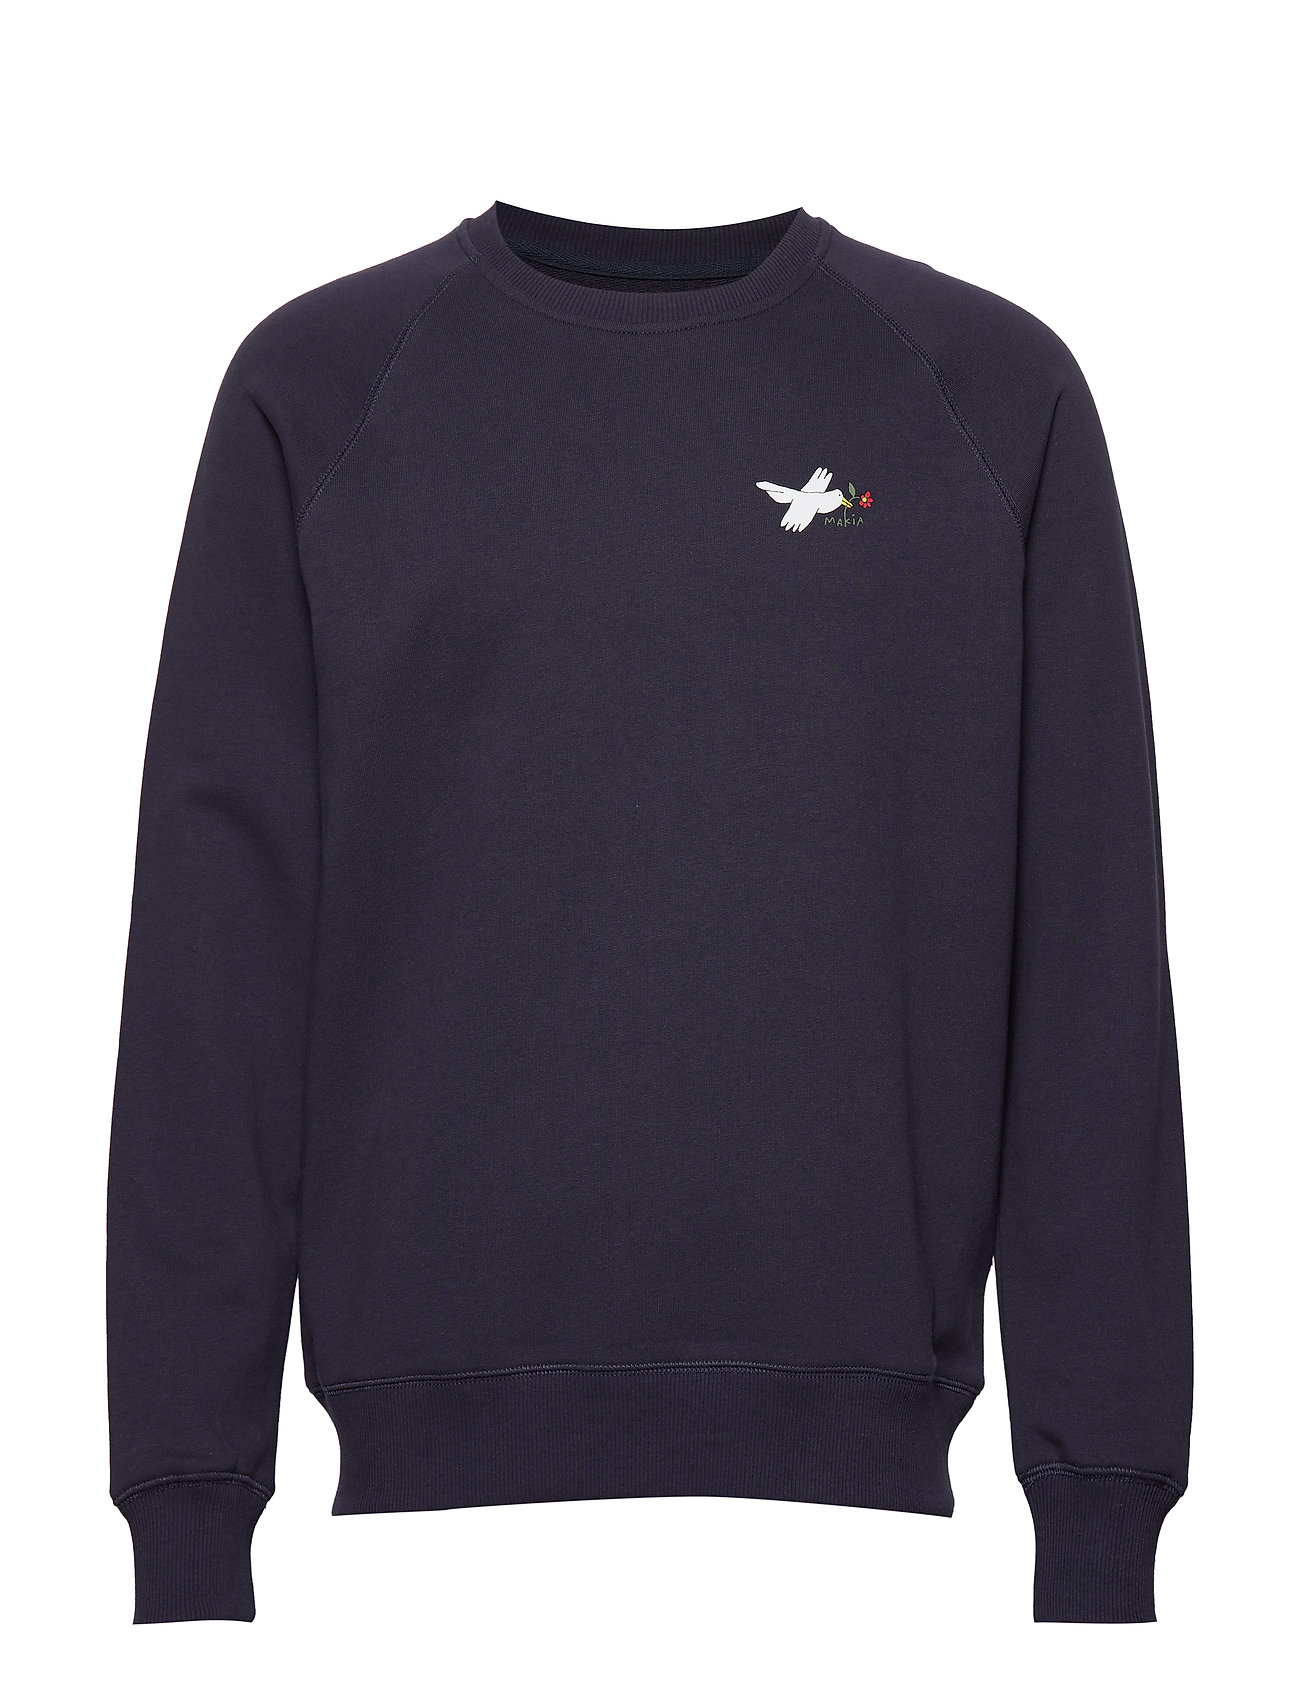 Makia Dove Sweatshirt - BLACK